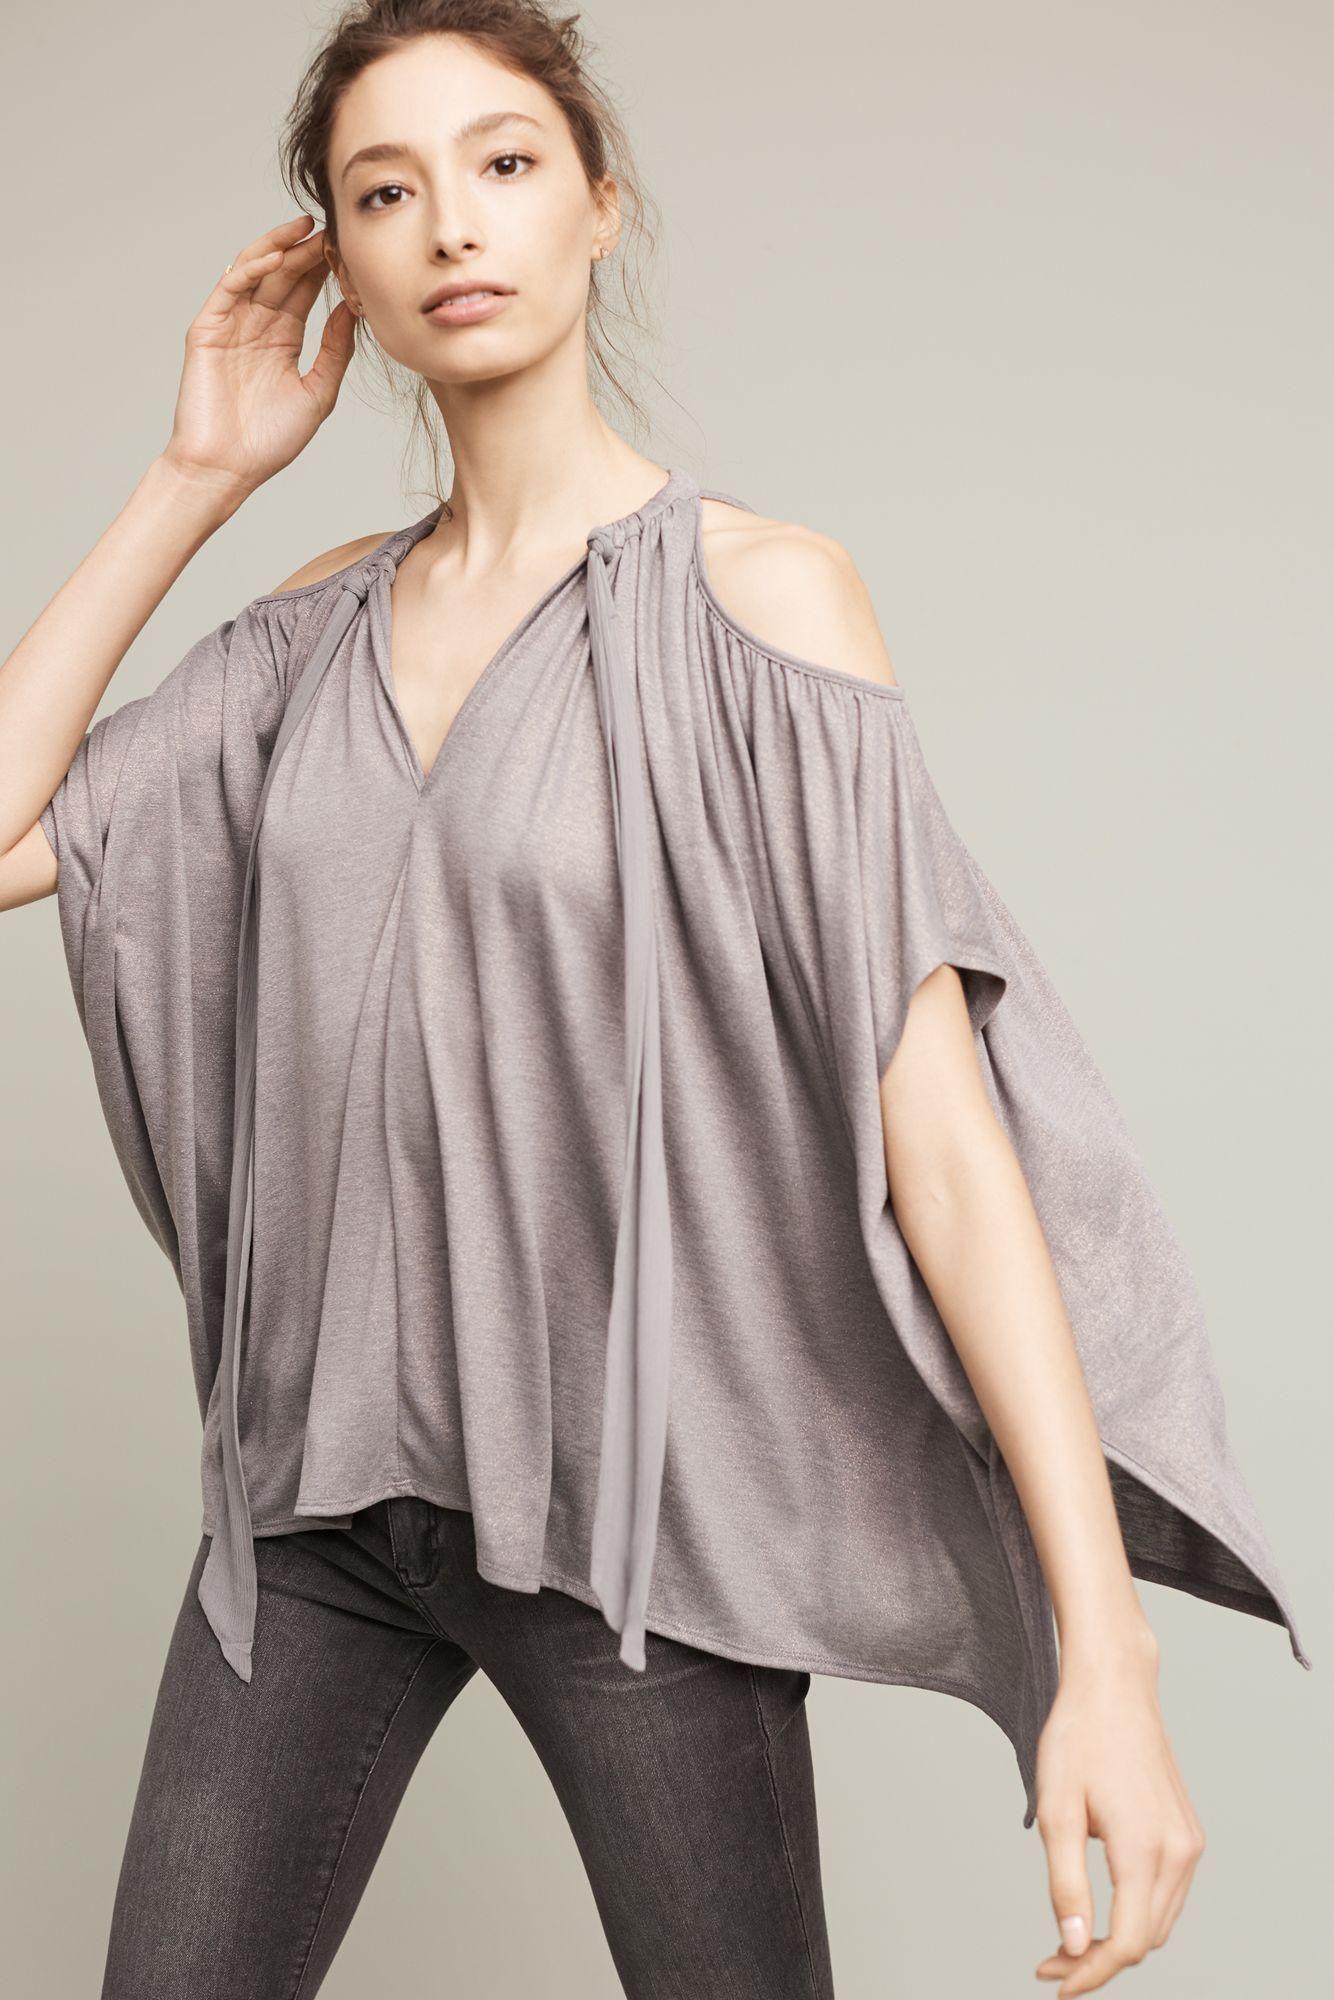 a3c8f347d631e Buy Deletta Women s Metallic Tulay Open-shoulder Top